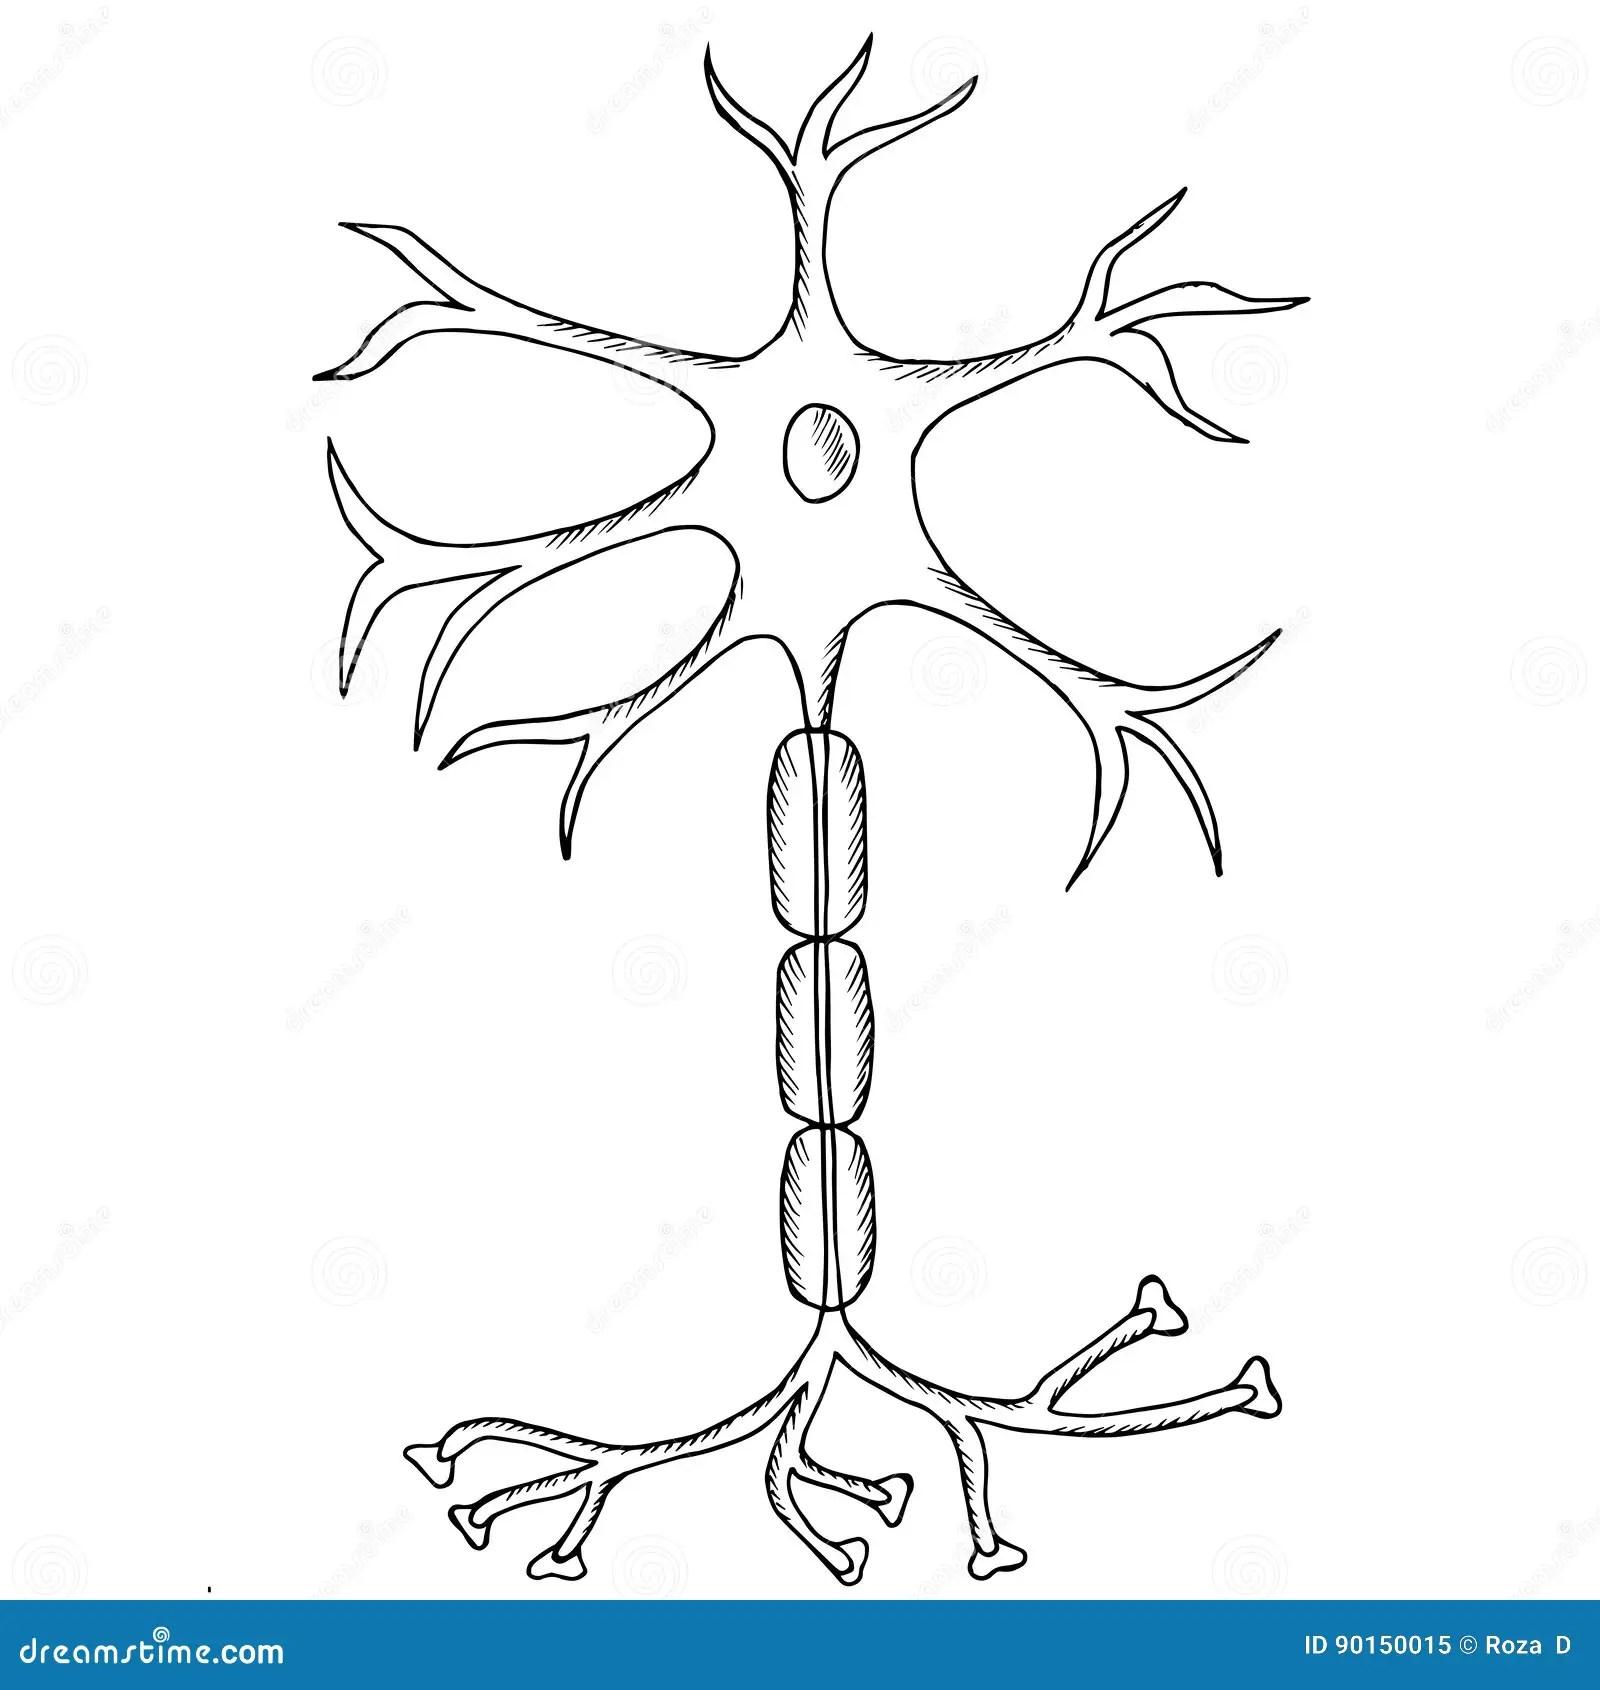 Neuron Sketch Stock Vector Illustration Of Nervous Axon